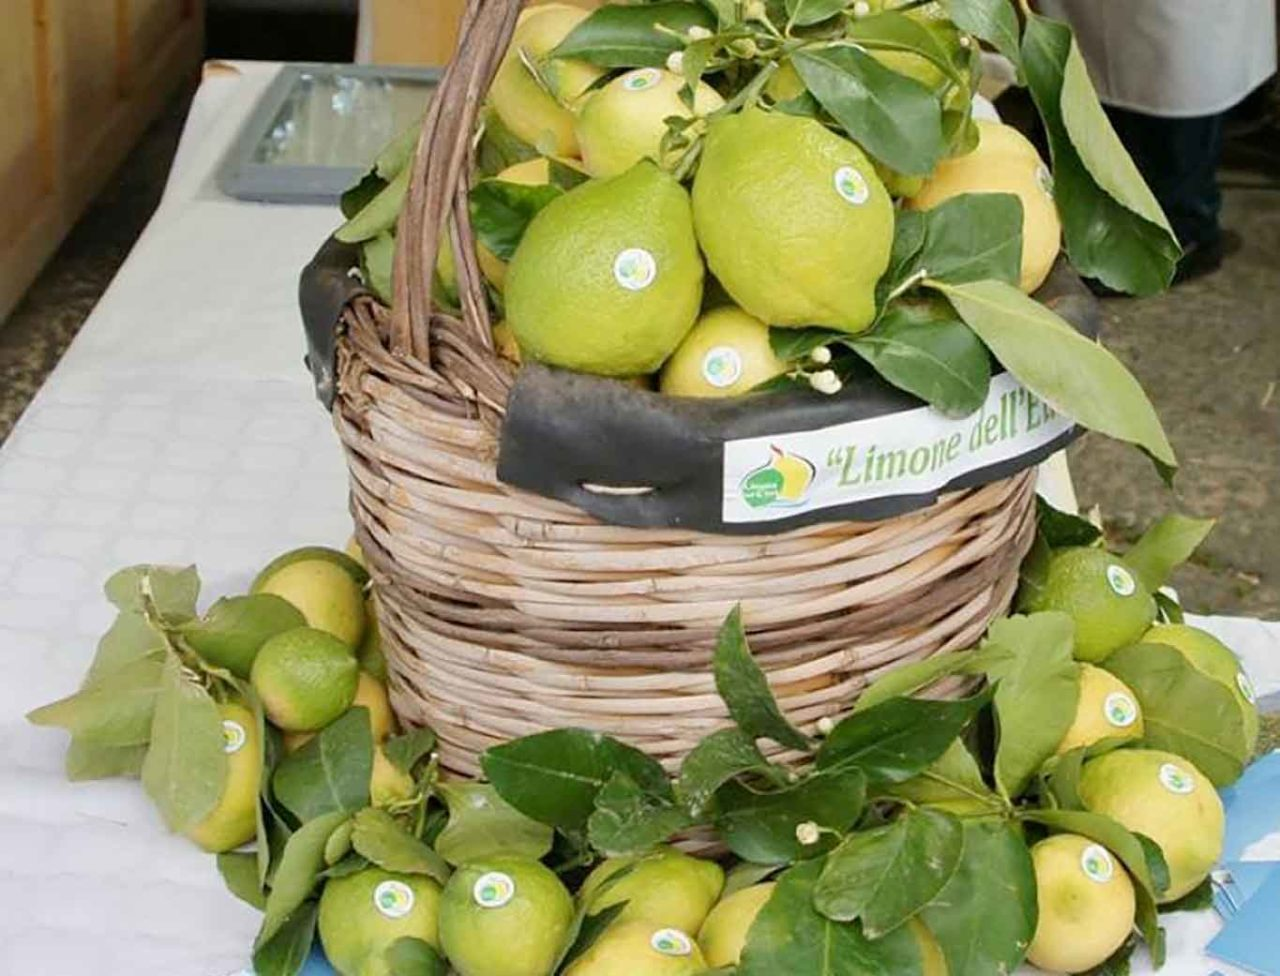 limoni dell'Etna